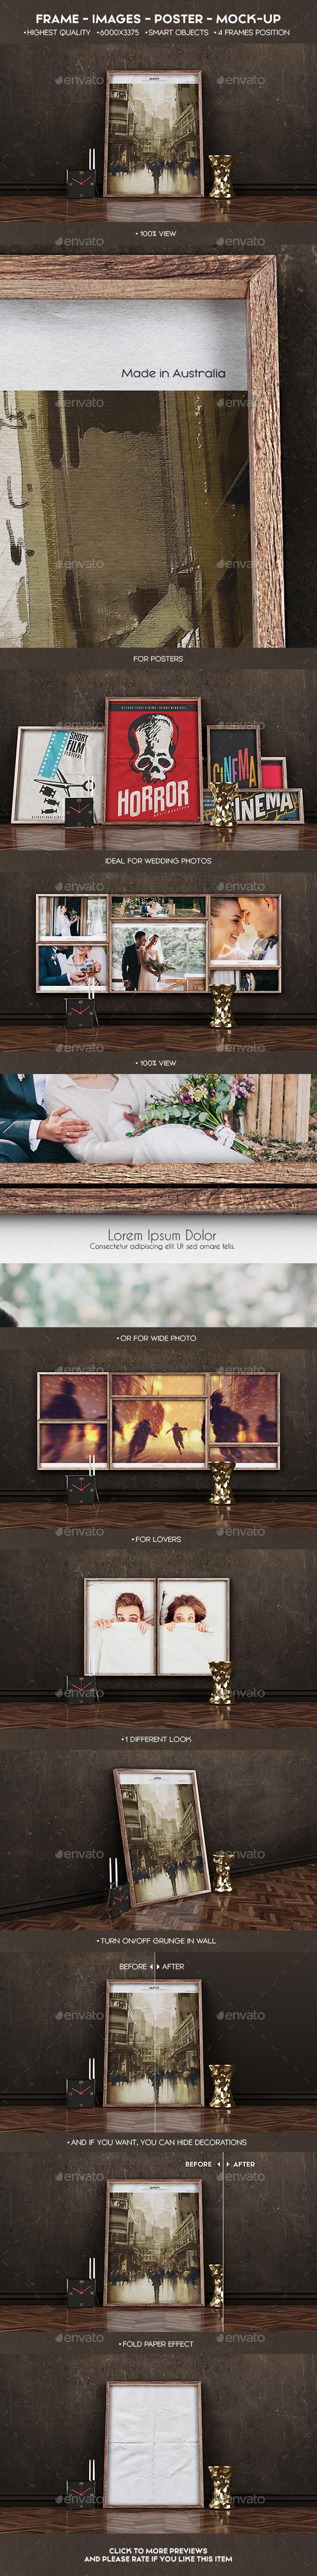 Frame Images Poster Mock-Up - Posters Print